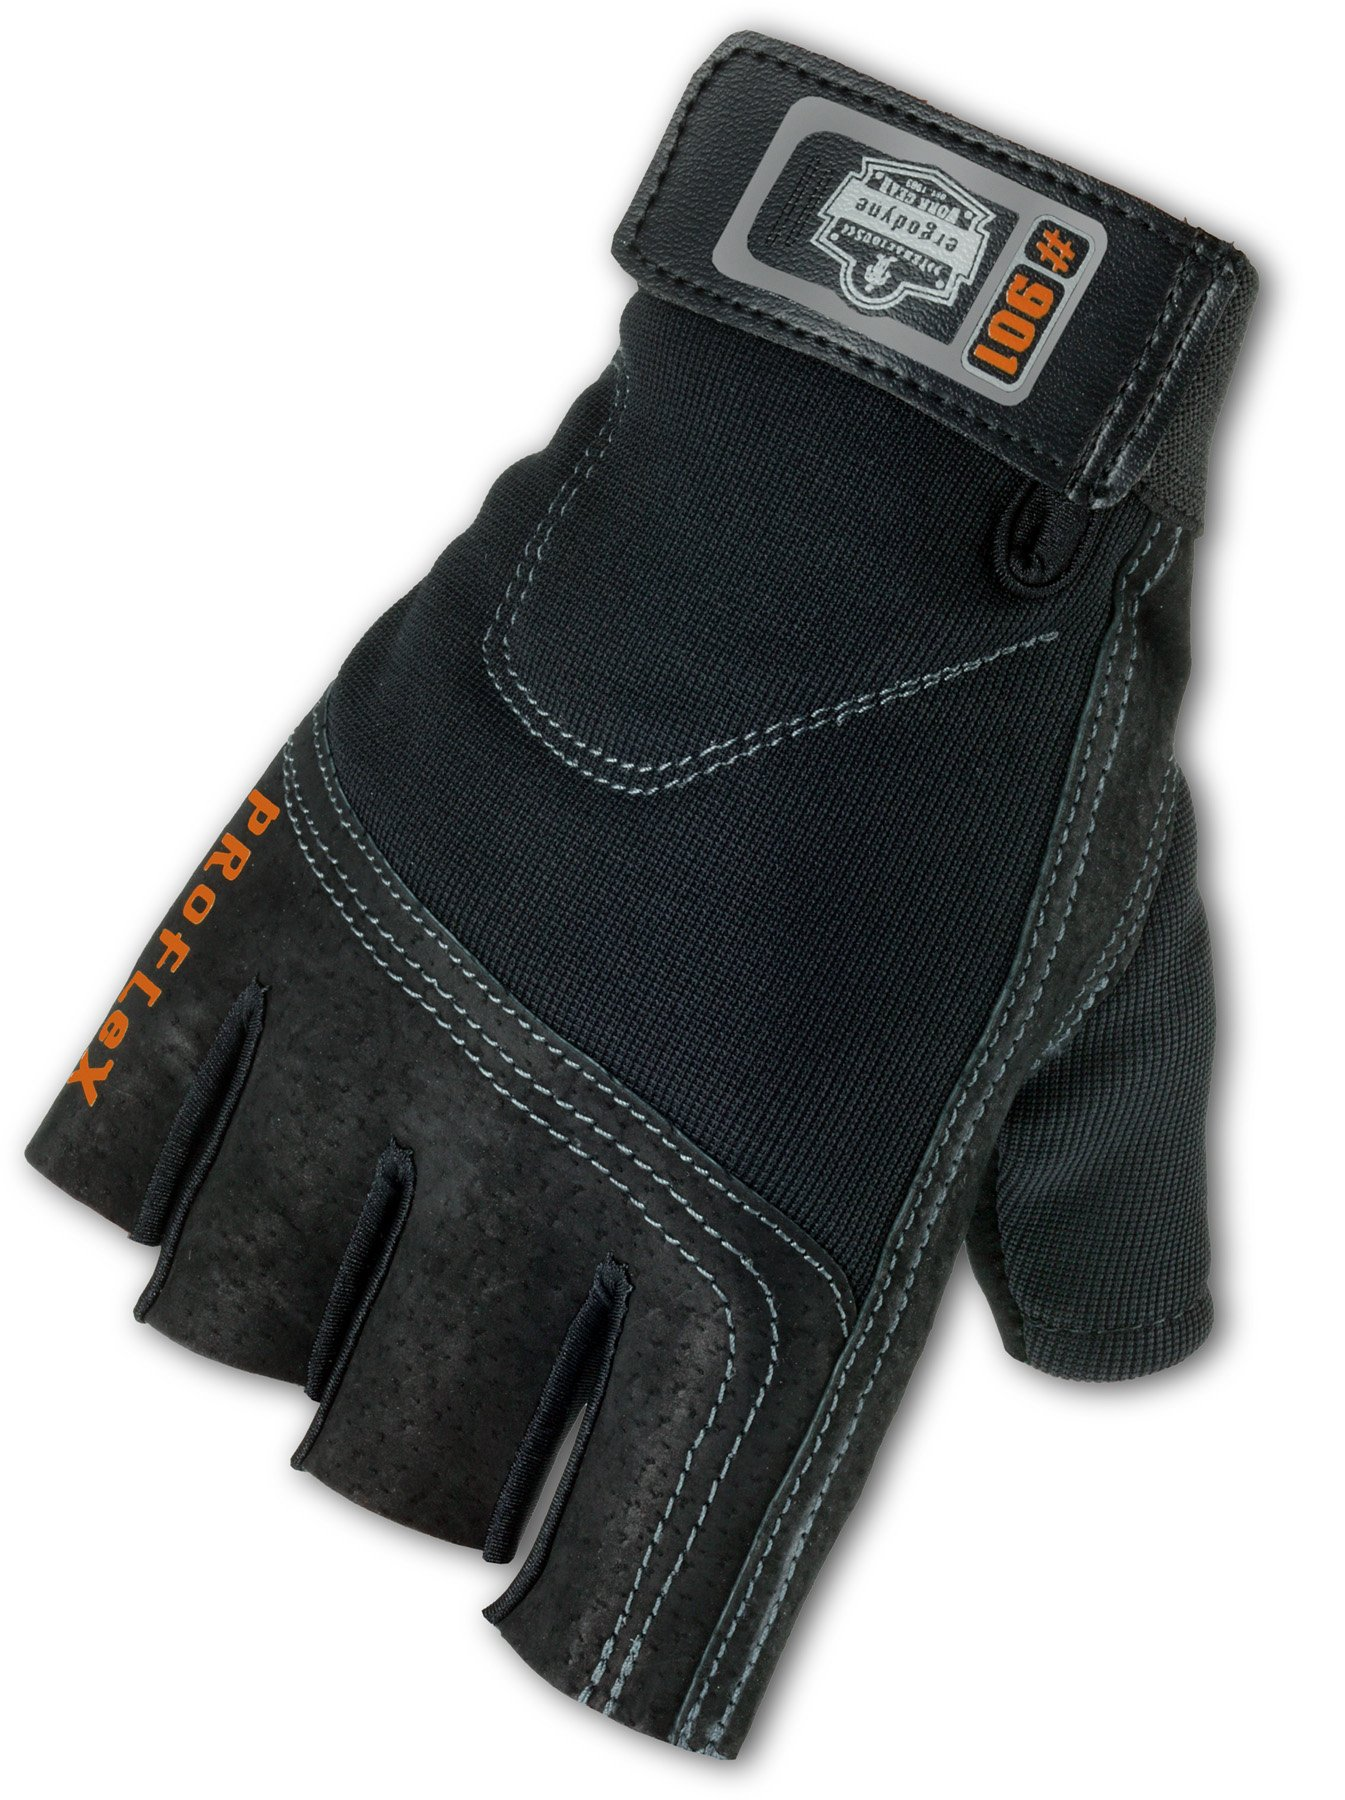 Ergodyne ProFlex 901 Impact Work Gloves, Large